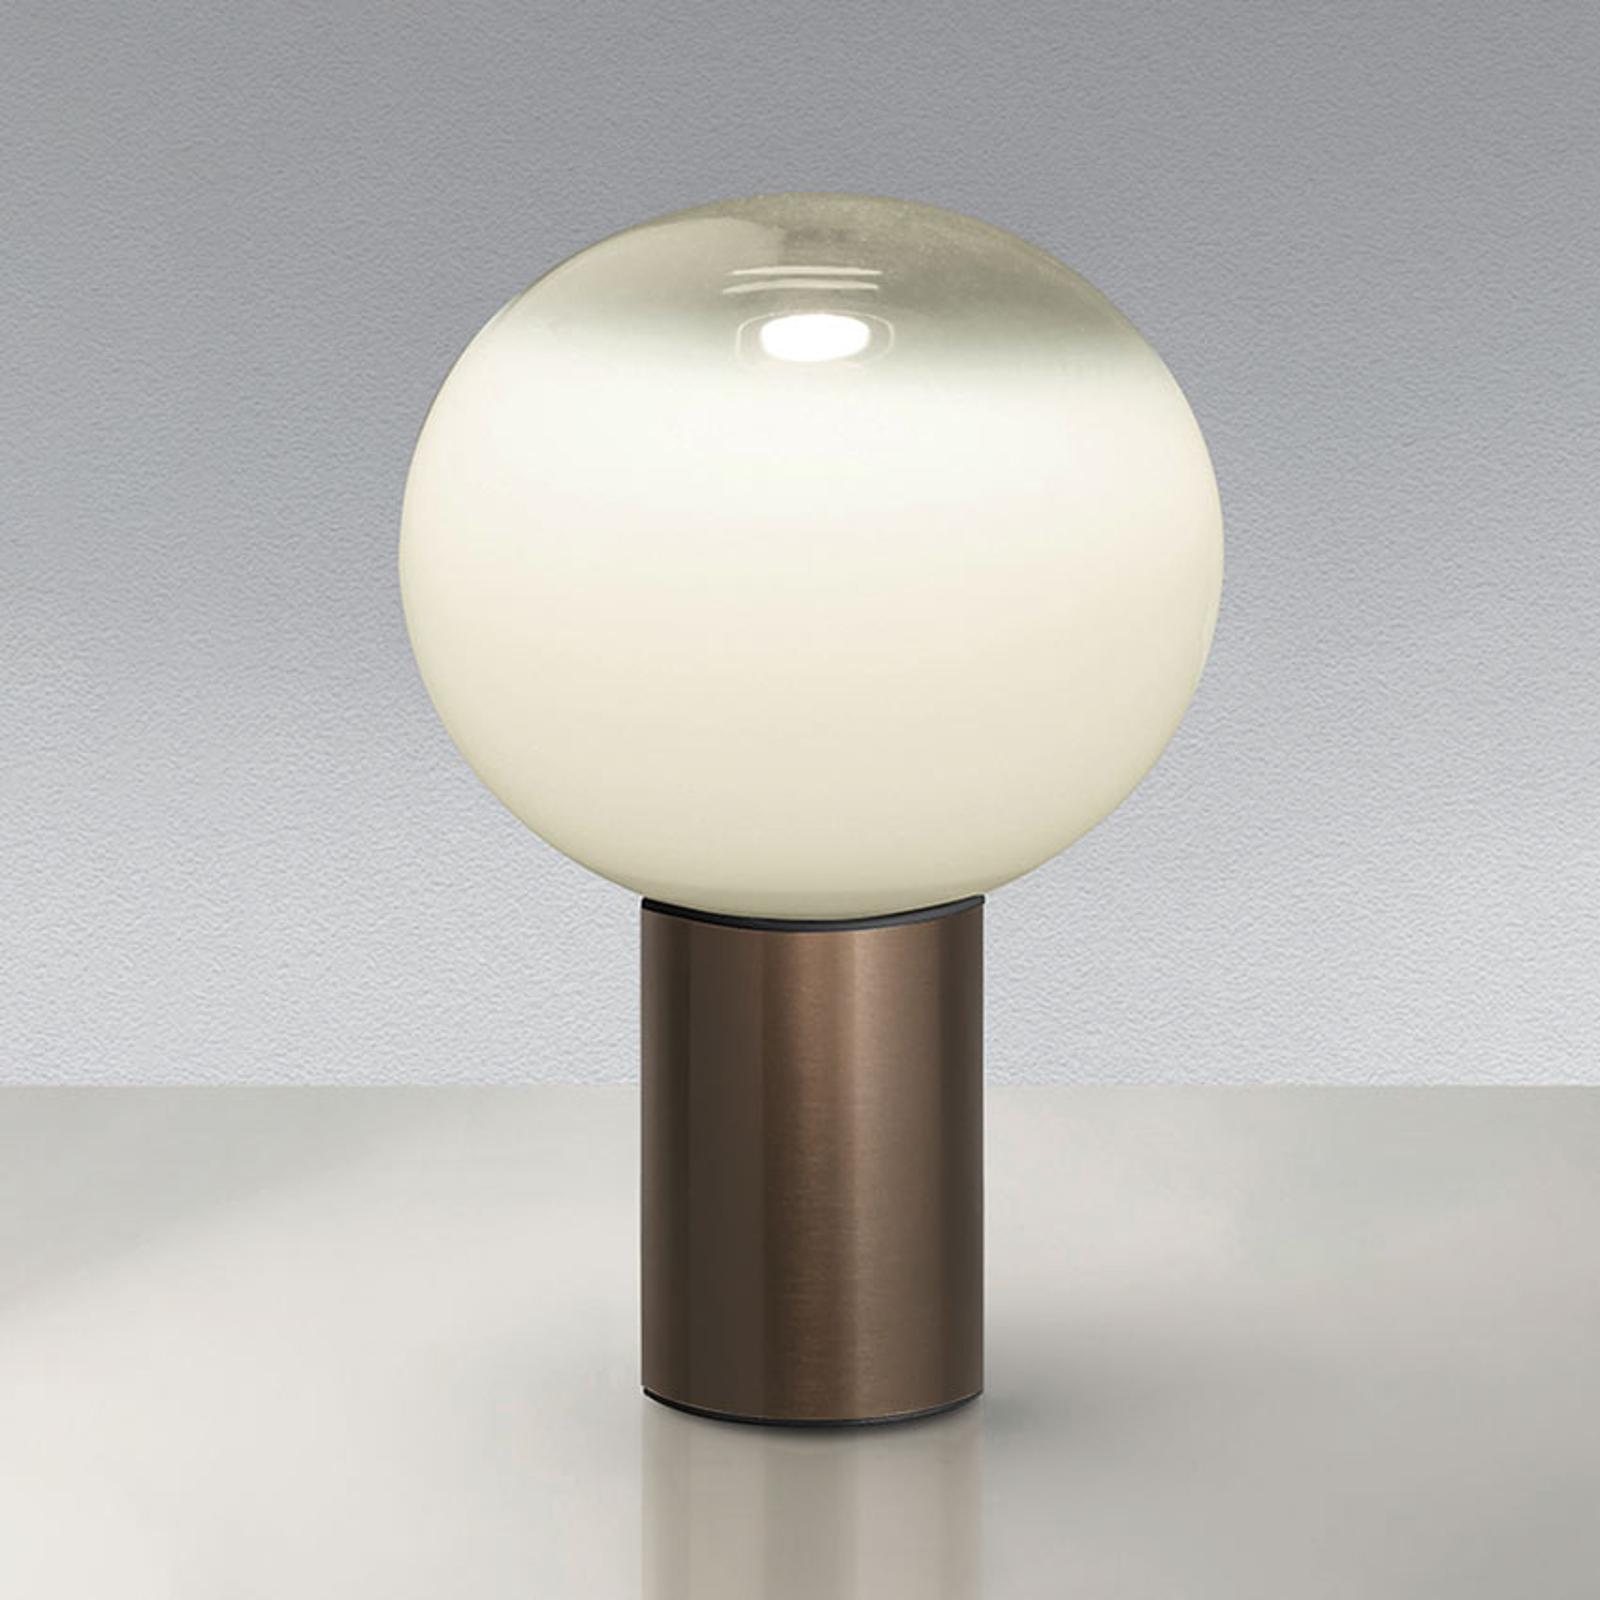 Artemide Laguna 16 lámpara de mesa bronce